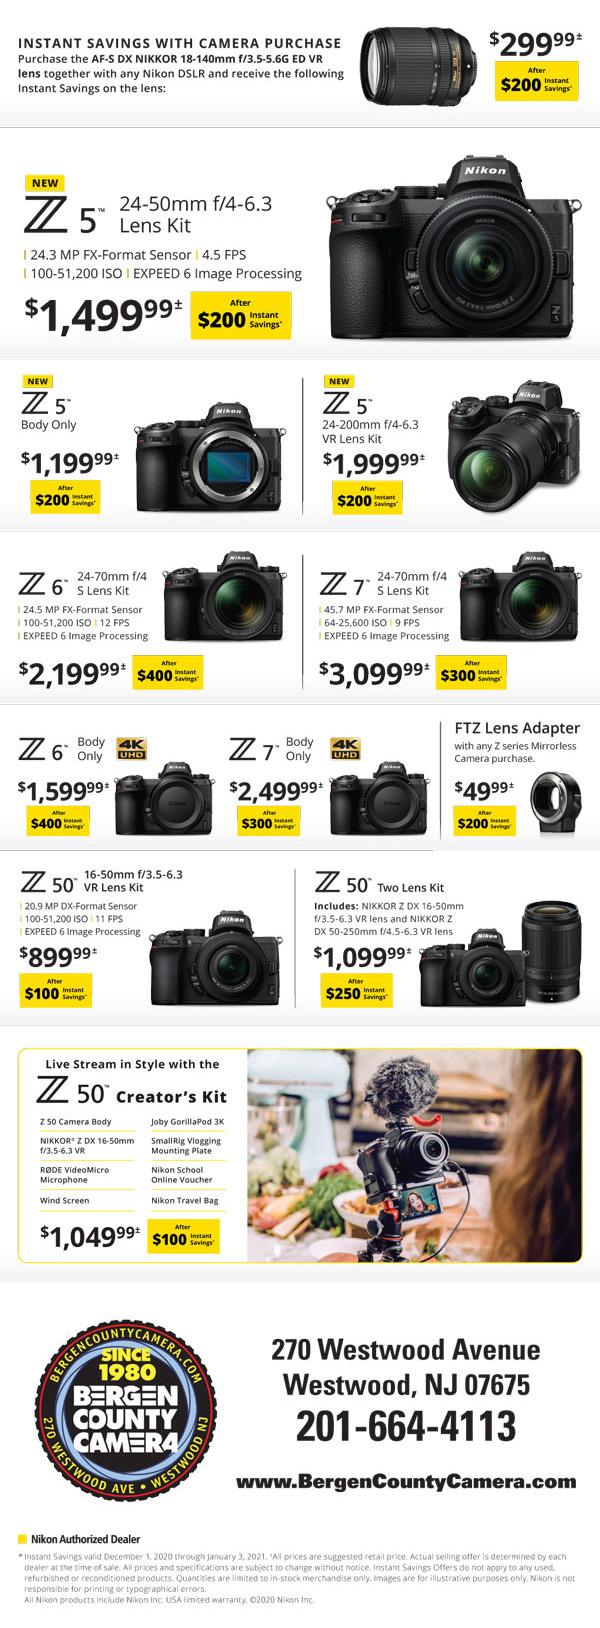 Z5 24-50mm f/4-6.3 Lens Kit $1499.99 after $200 instant savings - Z5 body $1199.99 after $200 instant savings - Z5 24-200mm f/4-6.3 VR lens kit $1999.99 after $200 instant savings - Z6 24-70mm f/4 S lens kit $2199.99 after $400 instant savings - Z7 24-70mm f/4 S lens kit $3099.99 after $300 instant savings - Z50 16-50mm f/3.5-6.3 VR lens kit $899.99 after $100 instant savings - Z50 two lens kit $1099.99 after $250 instant savings - Z50 Creator's Kit $1049.99 after $100 instant savings